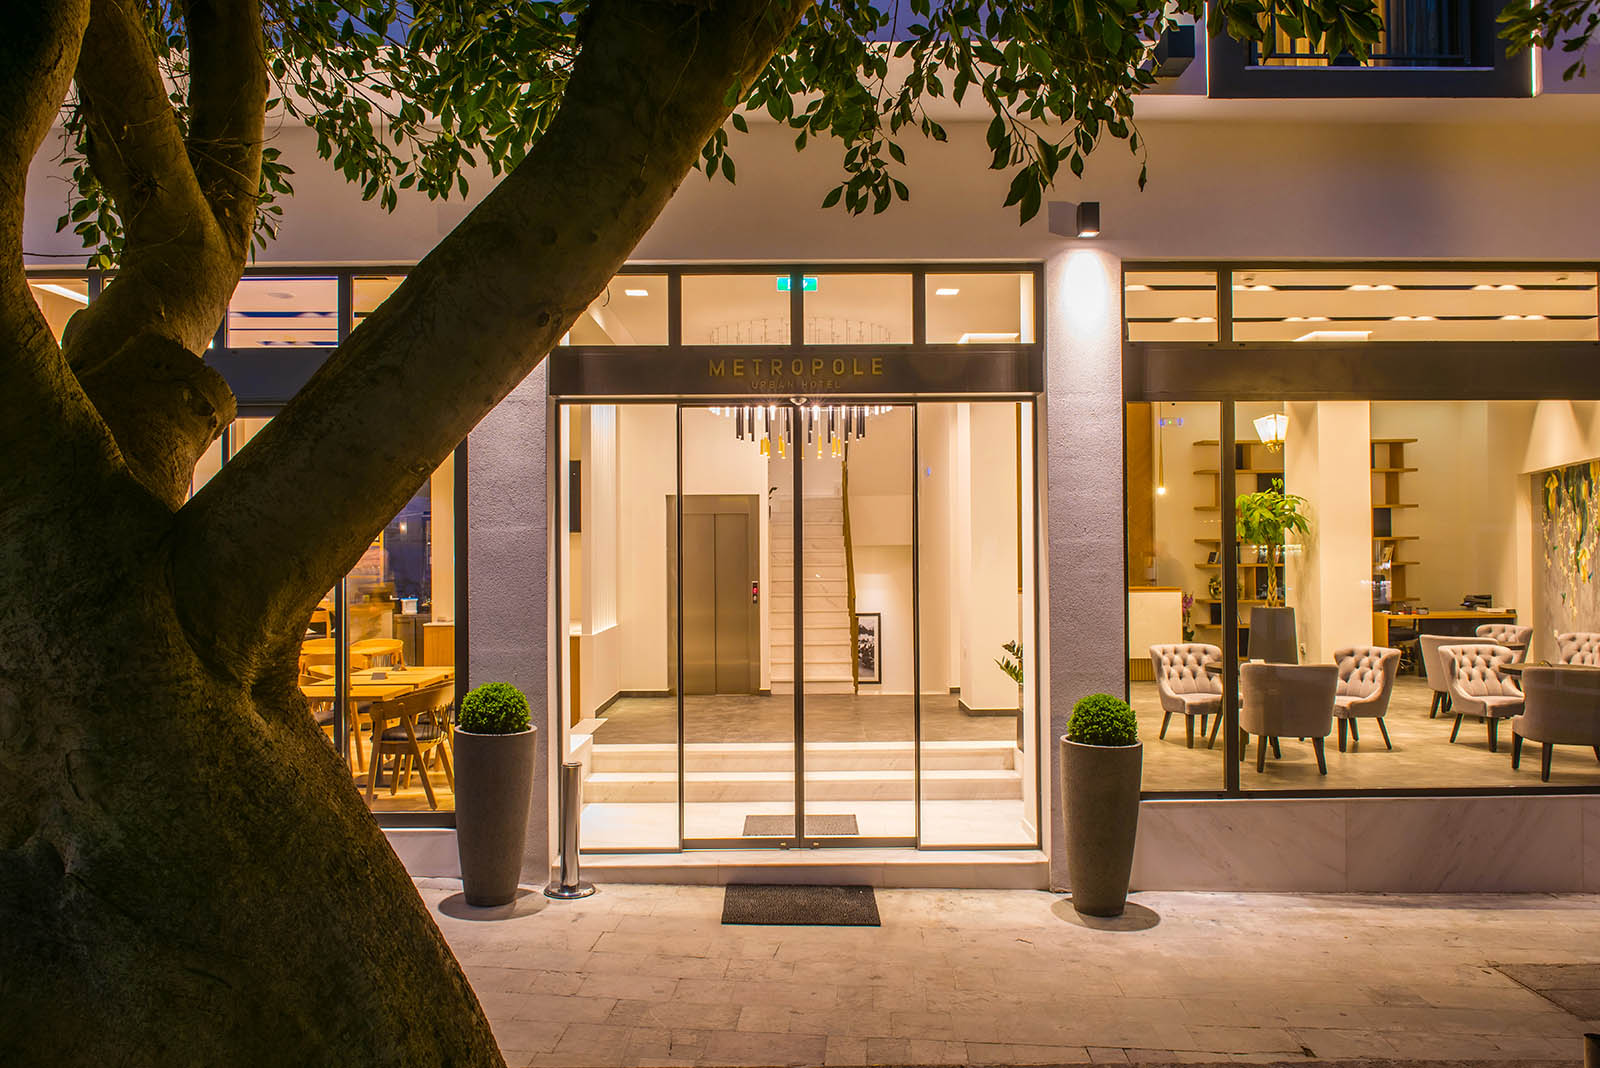 accommodation heraklion - Metropole Urban Hotel